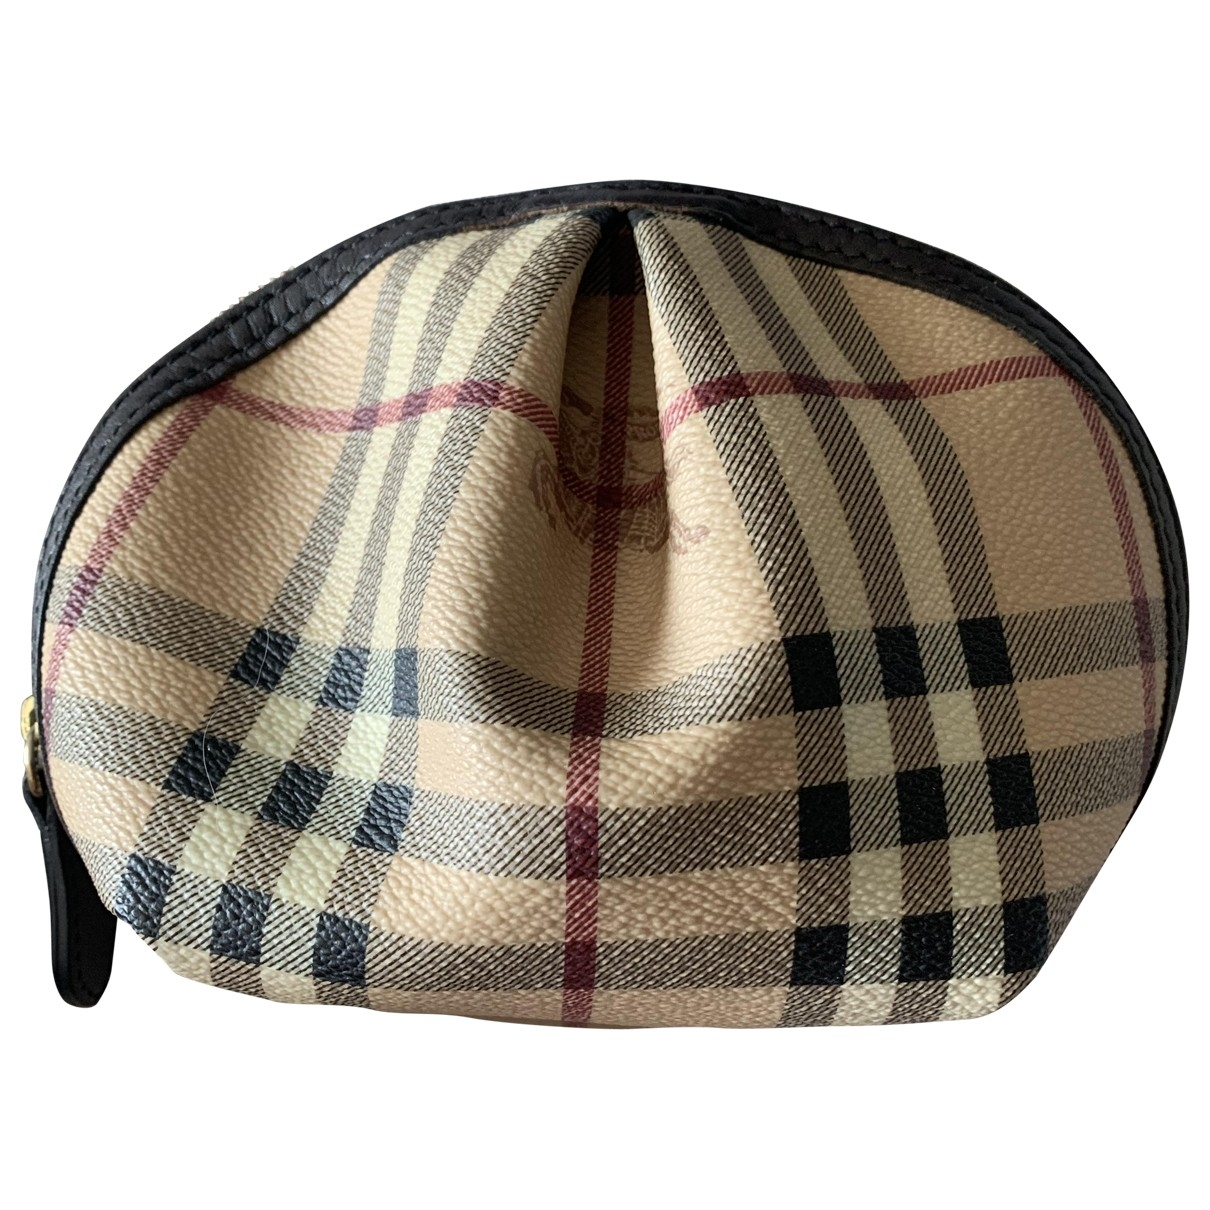 Burberry \N Beige Cloth Travel bag for Women \N